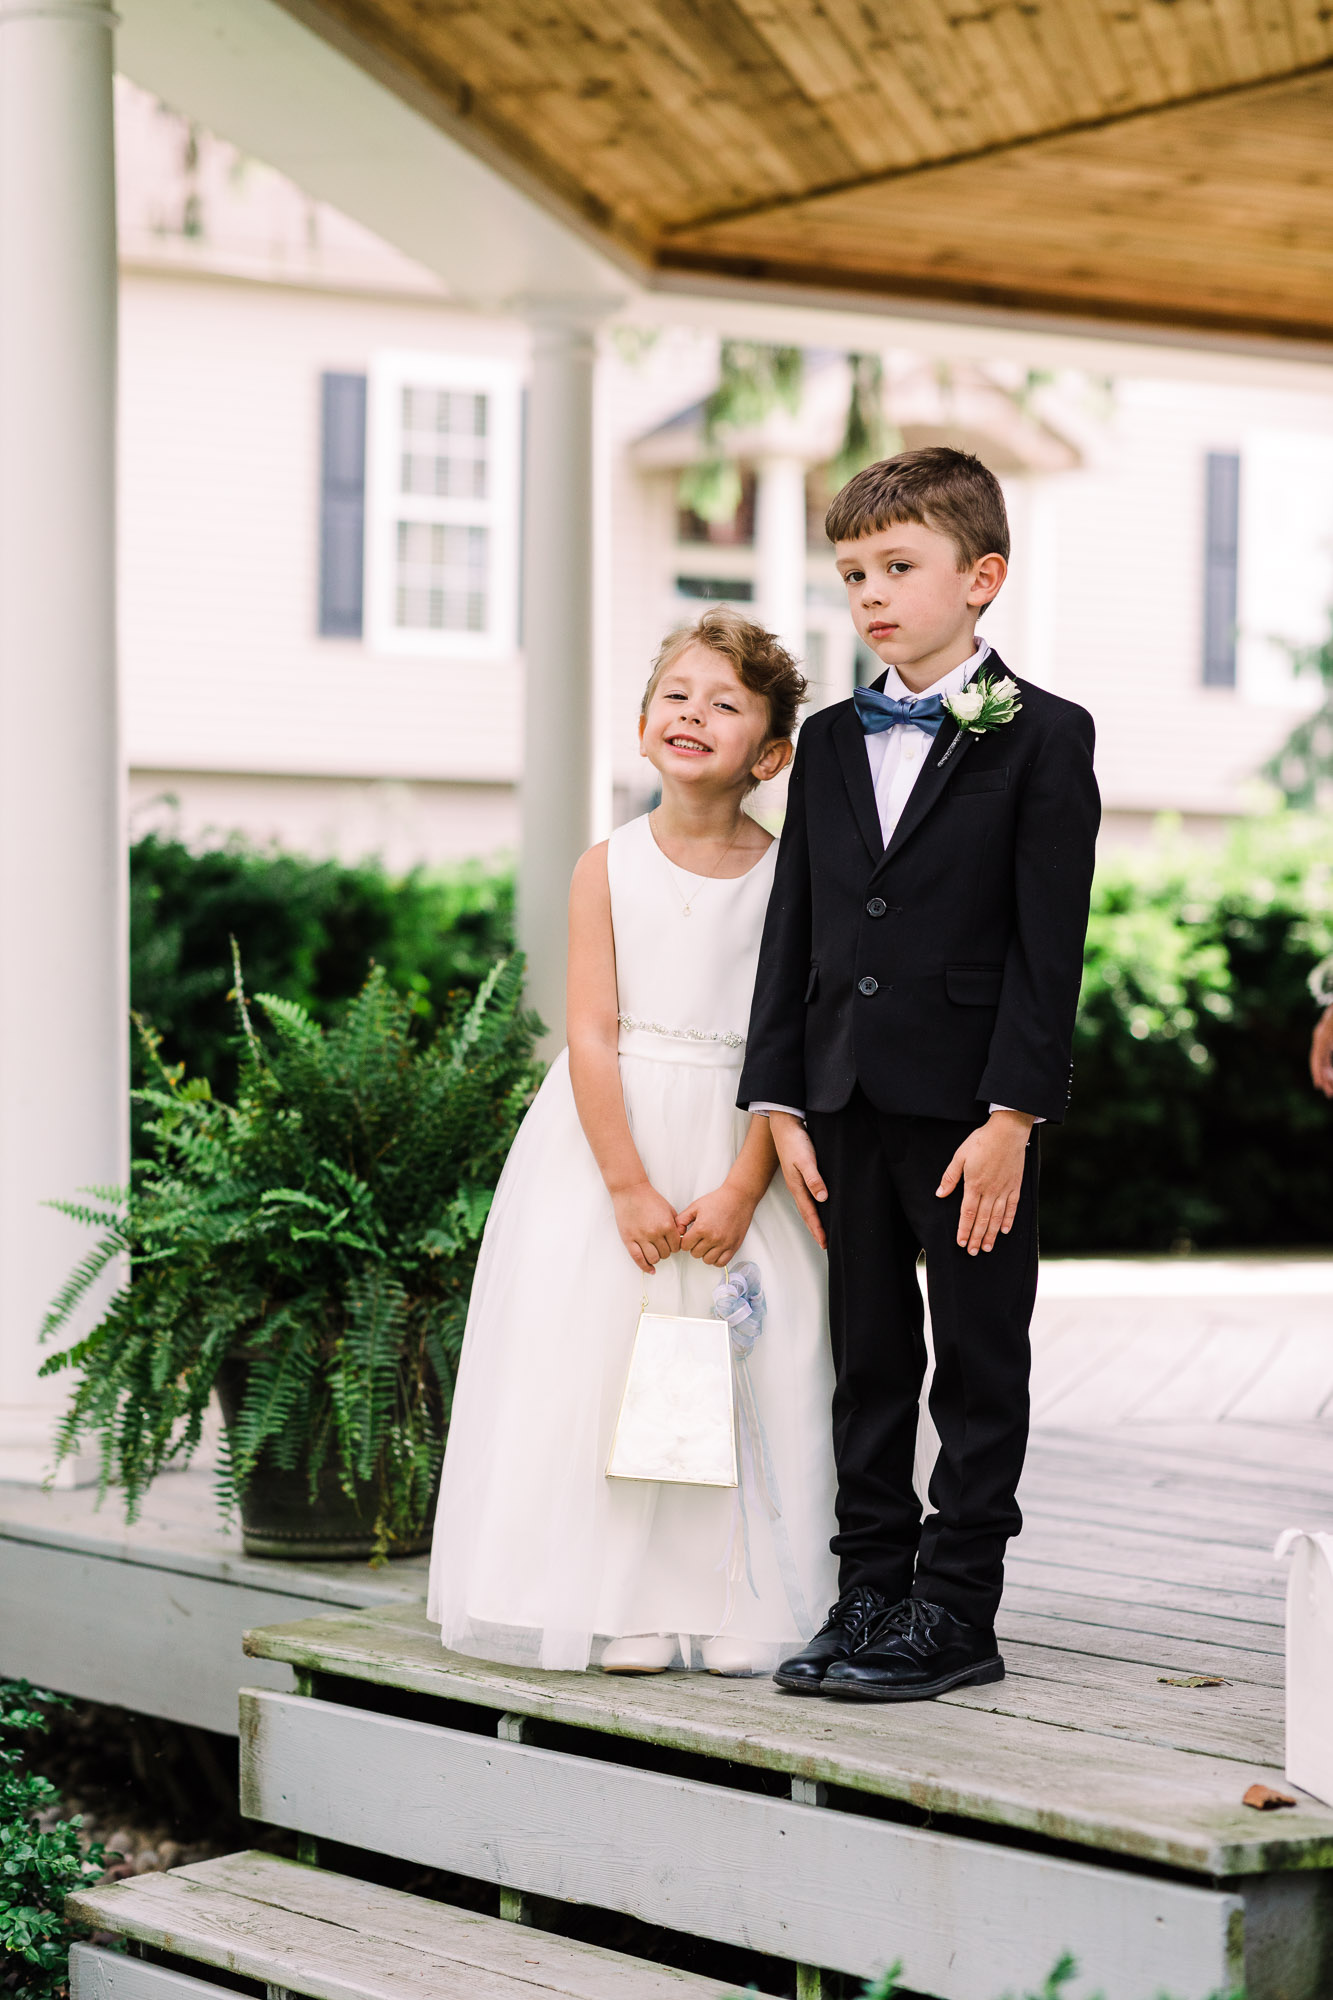 isle-of-que-wedding-6672.jpg